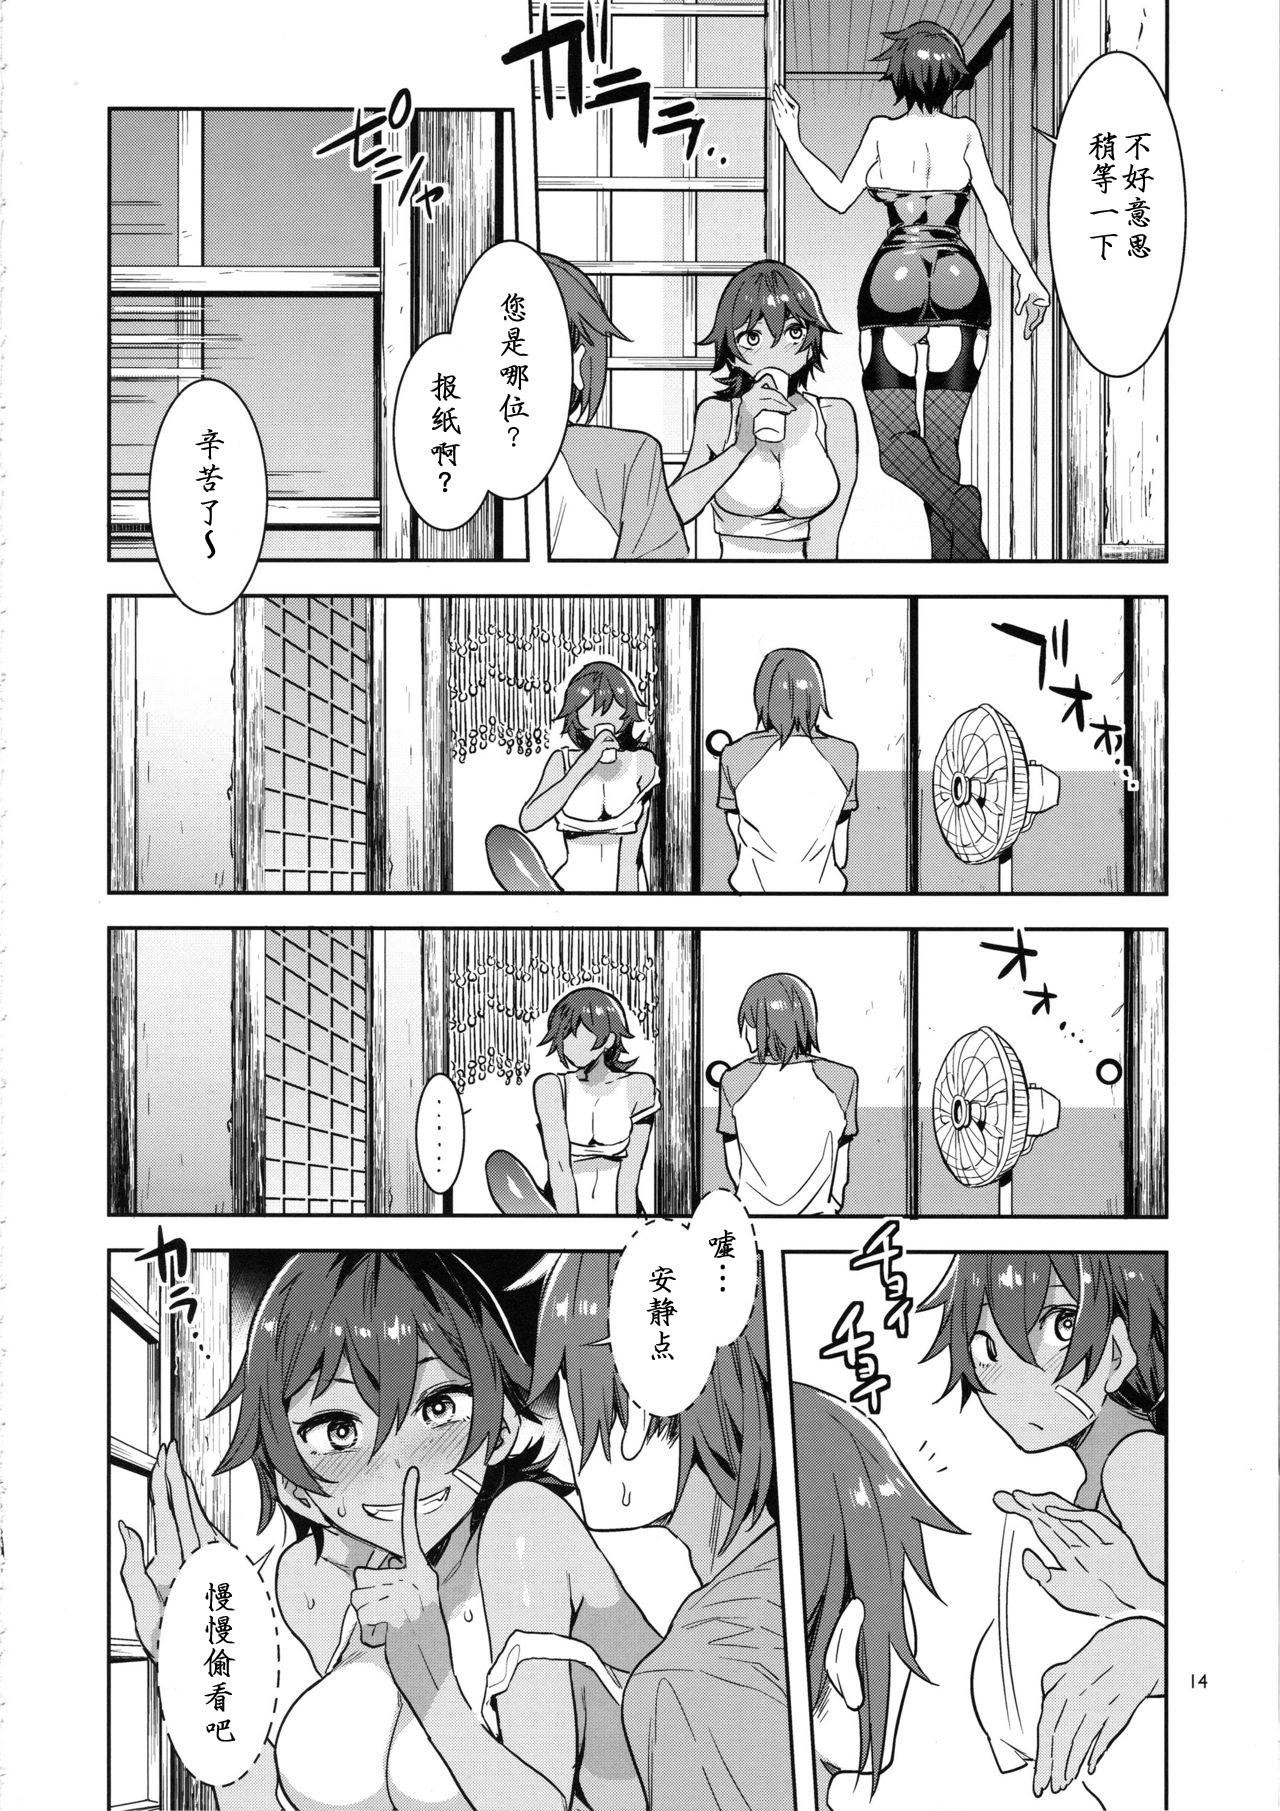 Teisou Kannen Zero no Onna Tomodachi no Haha 12